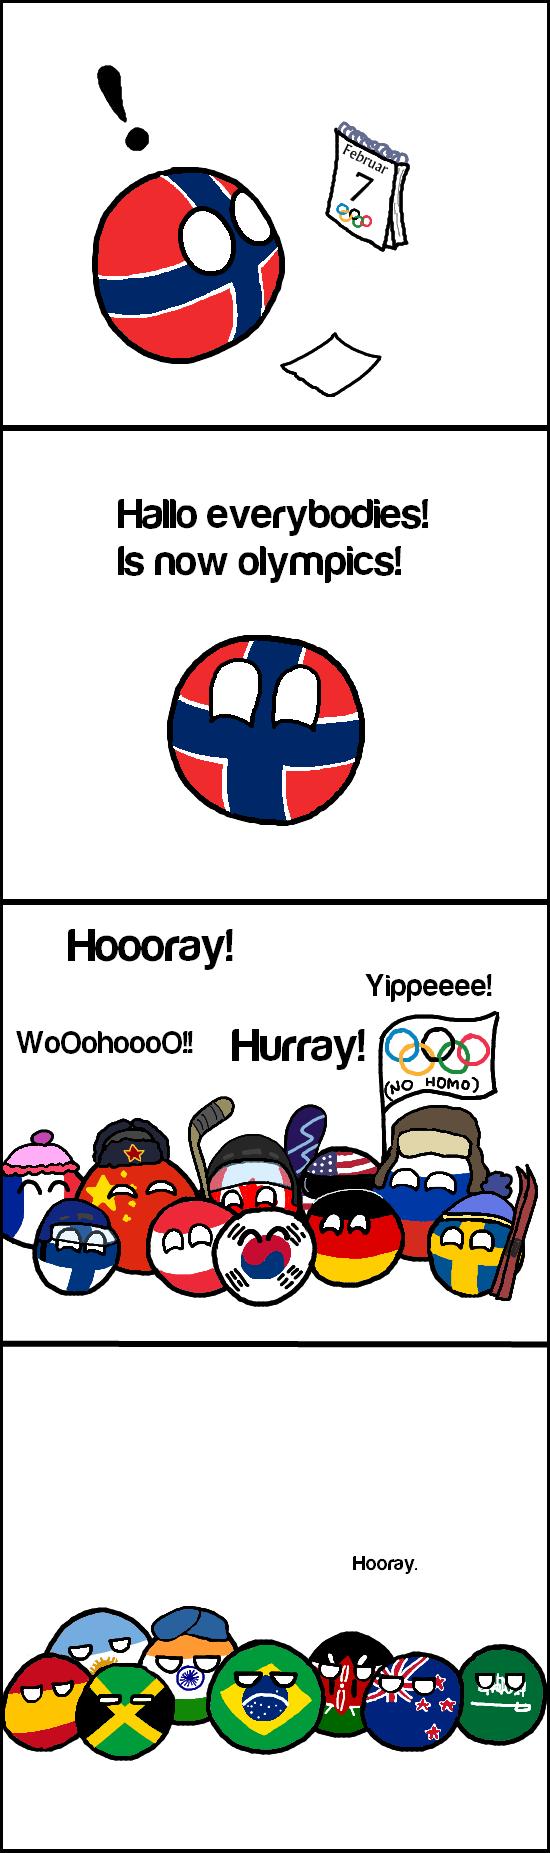 So it begins. r/polandball (disneyvillain) reddit.com/r/polandball/comments/1xb2ri/snowlympics/. Hallo ! Is now olympics! Hooraay! Hurray!. Some people, you know they can't believe! Jamaica, we have a bob-sled team! Olympics Polandball Sochi